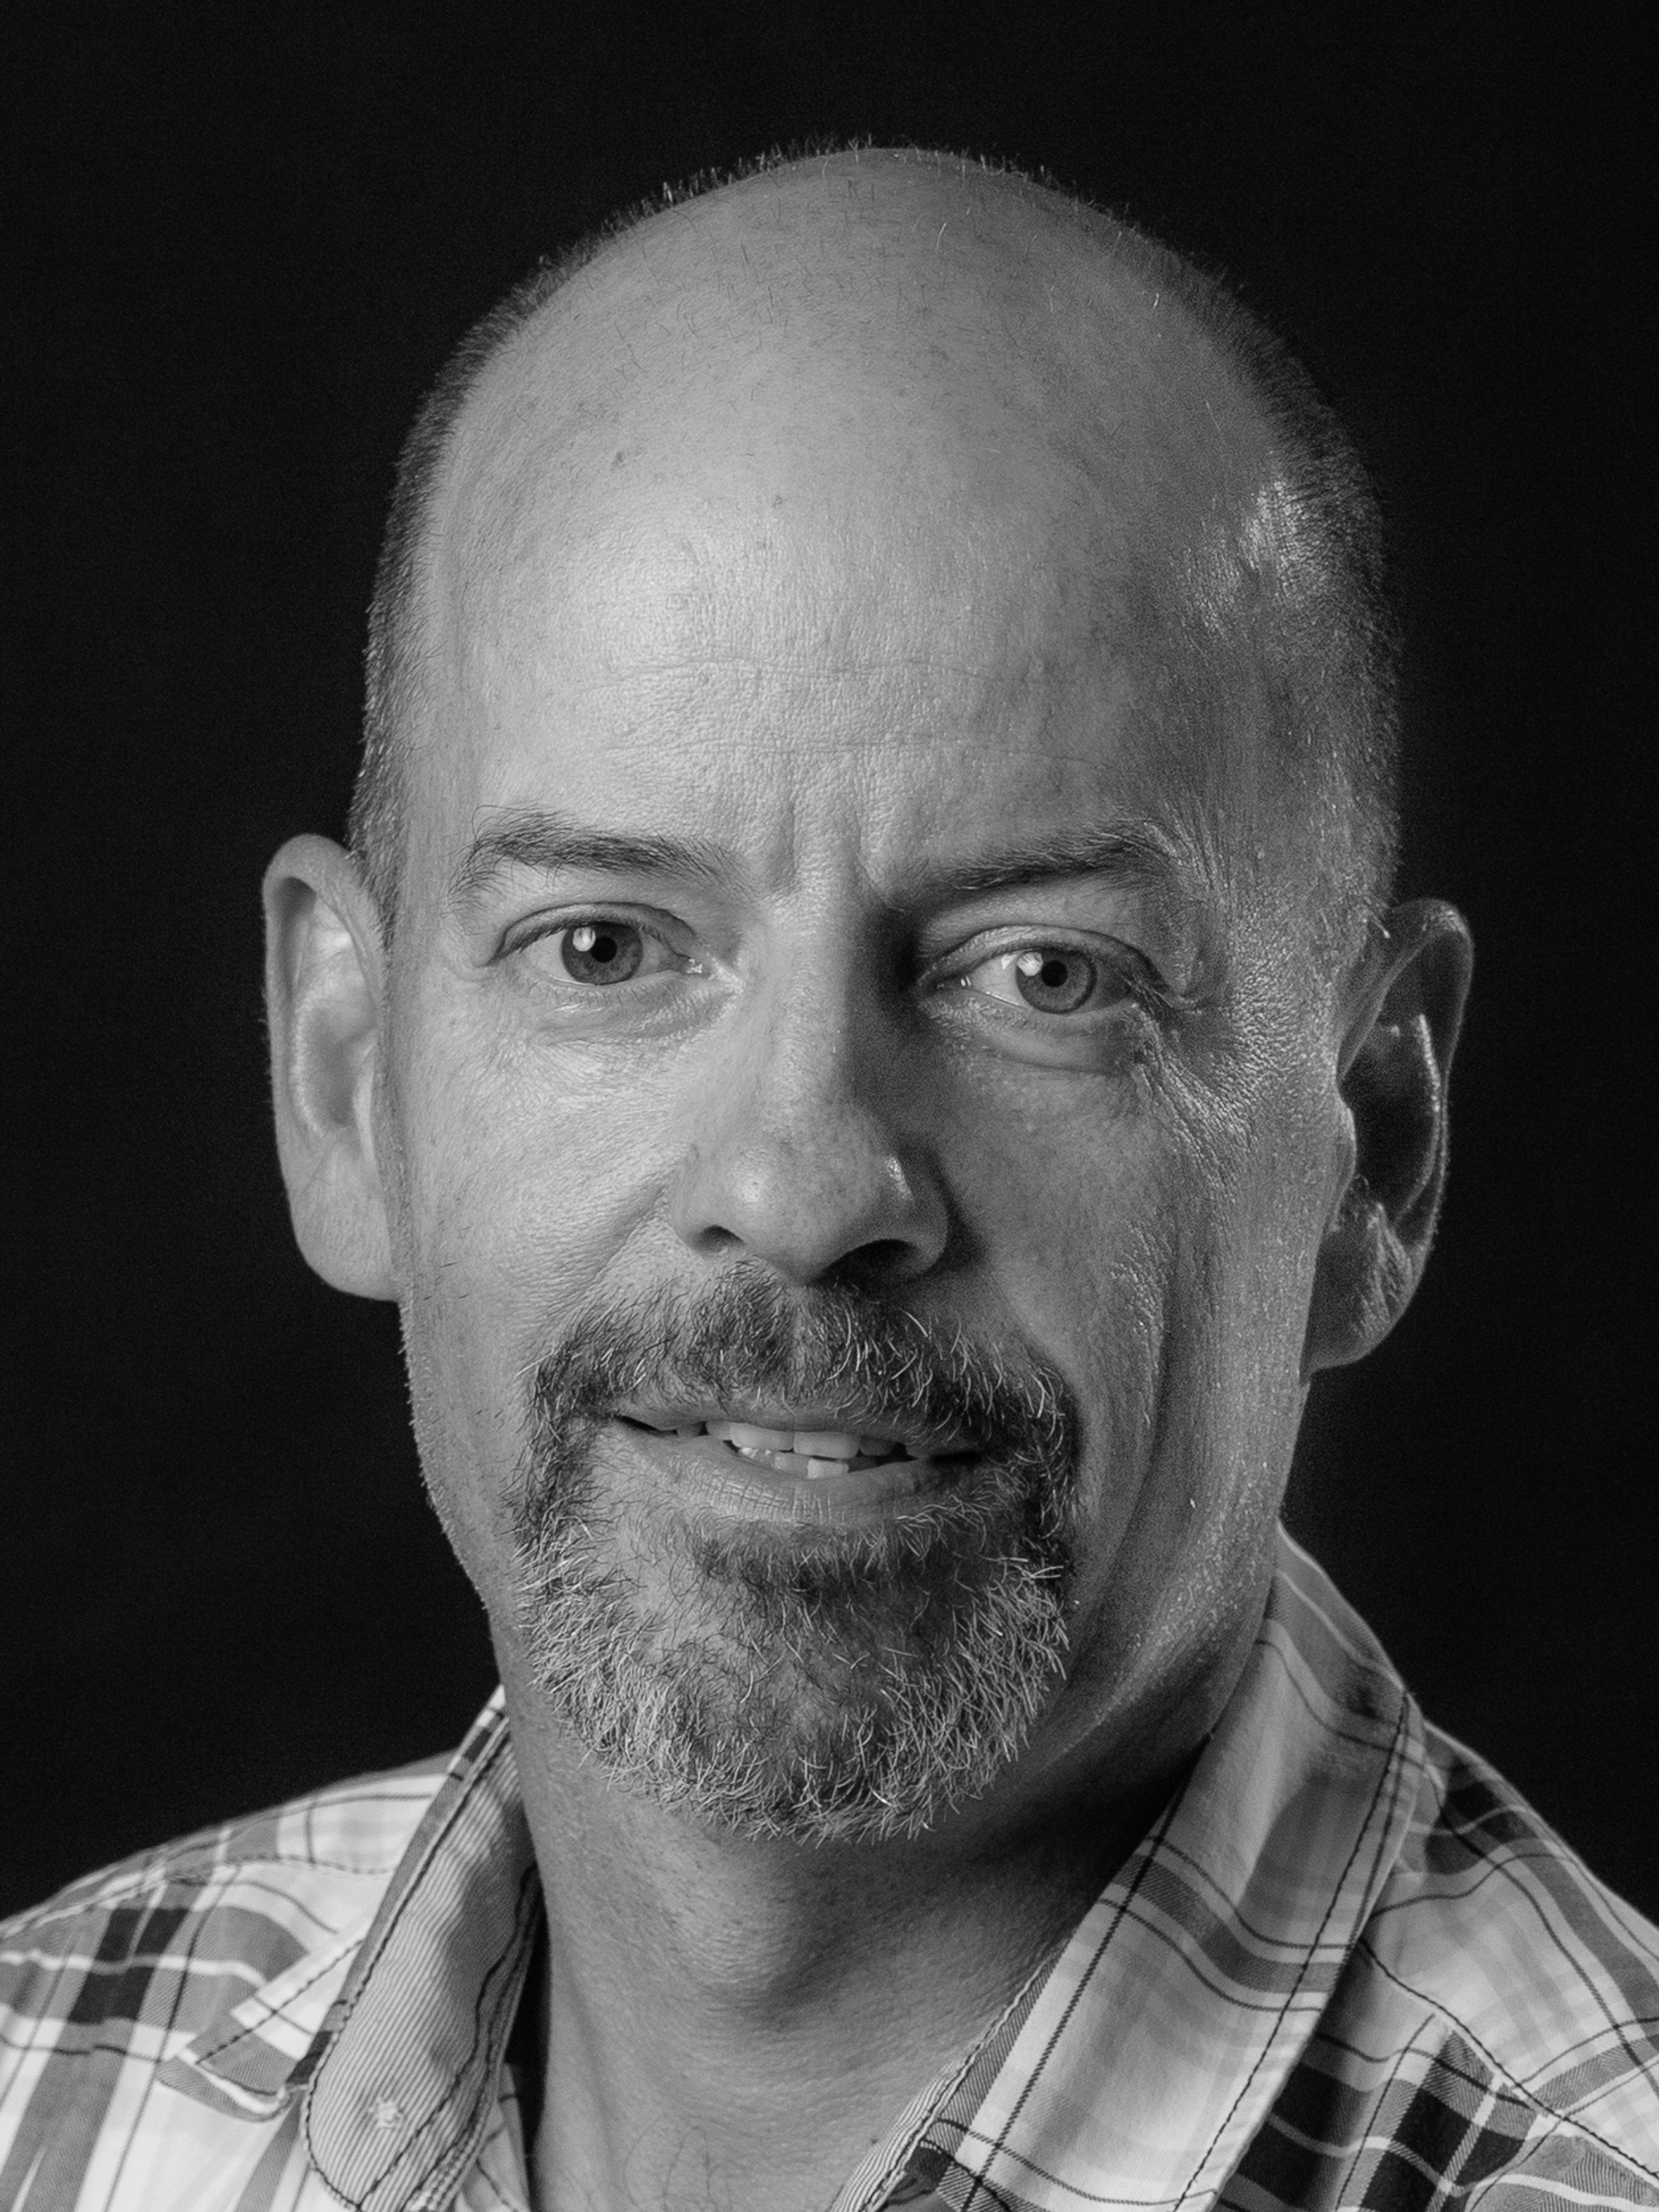 Fotograf Jørn Johansen